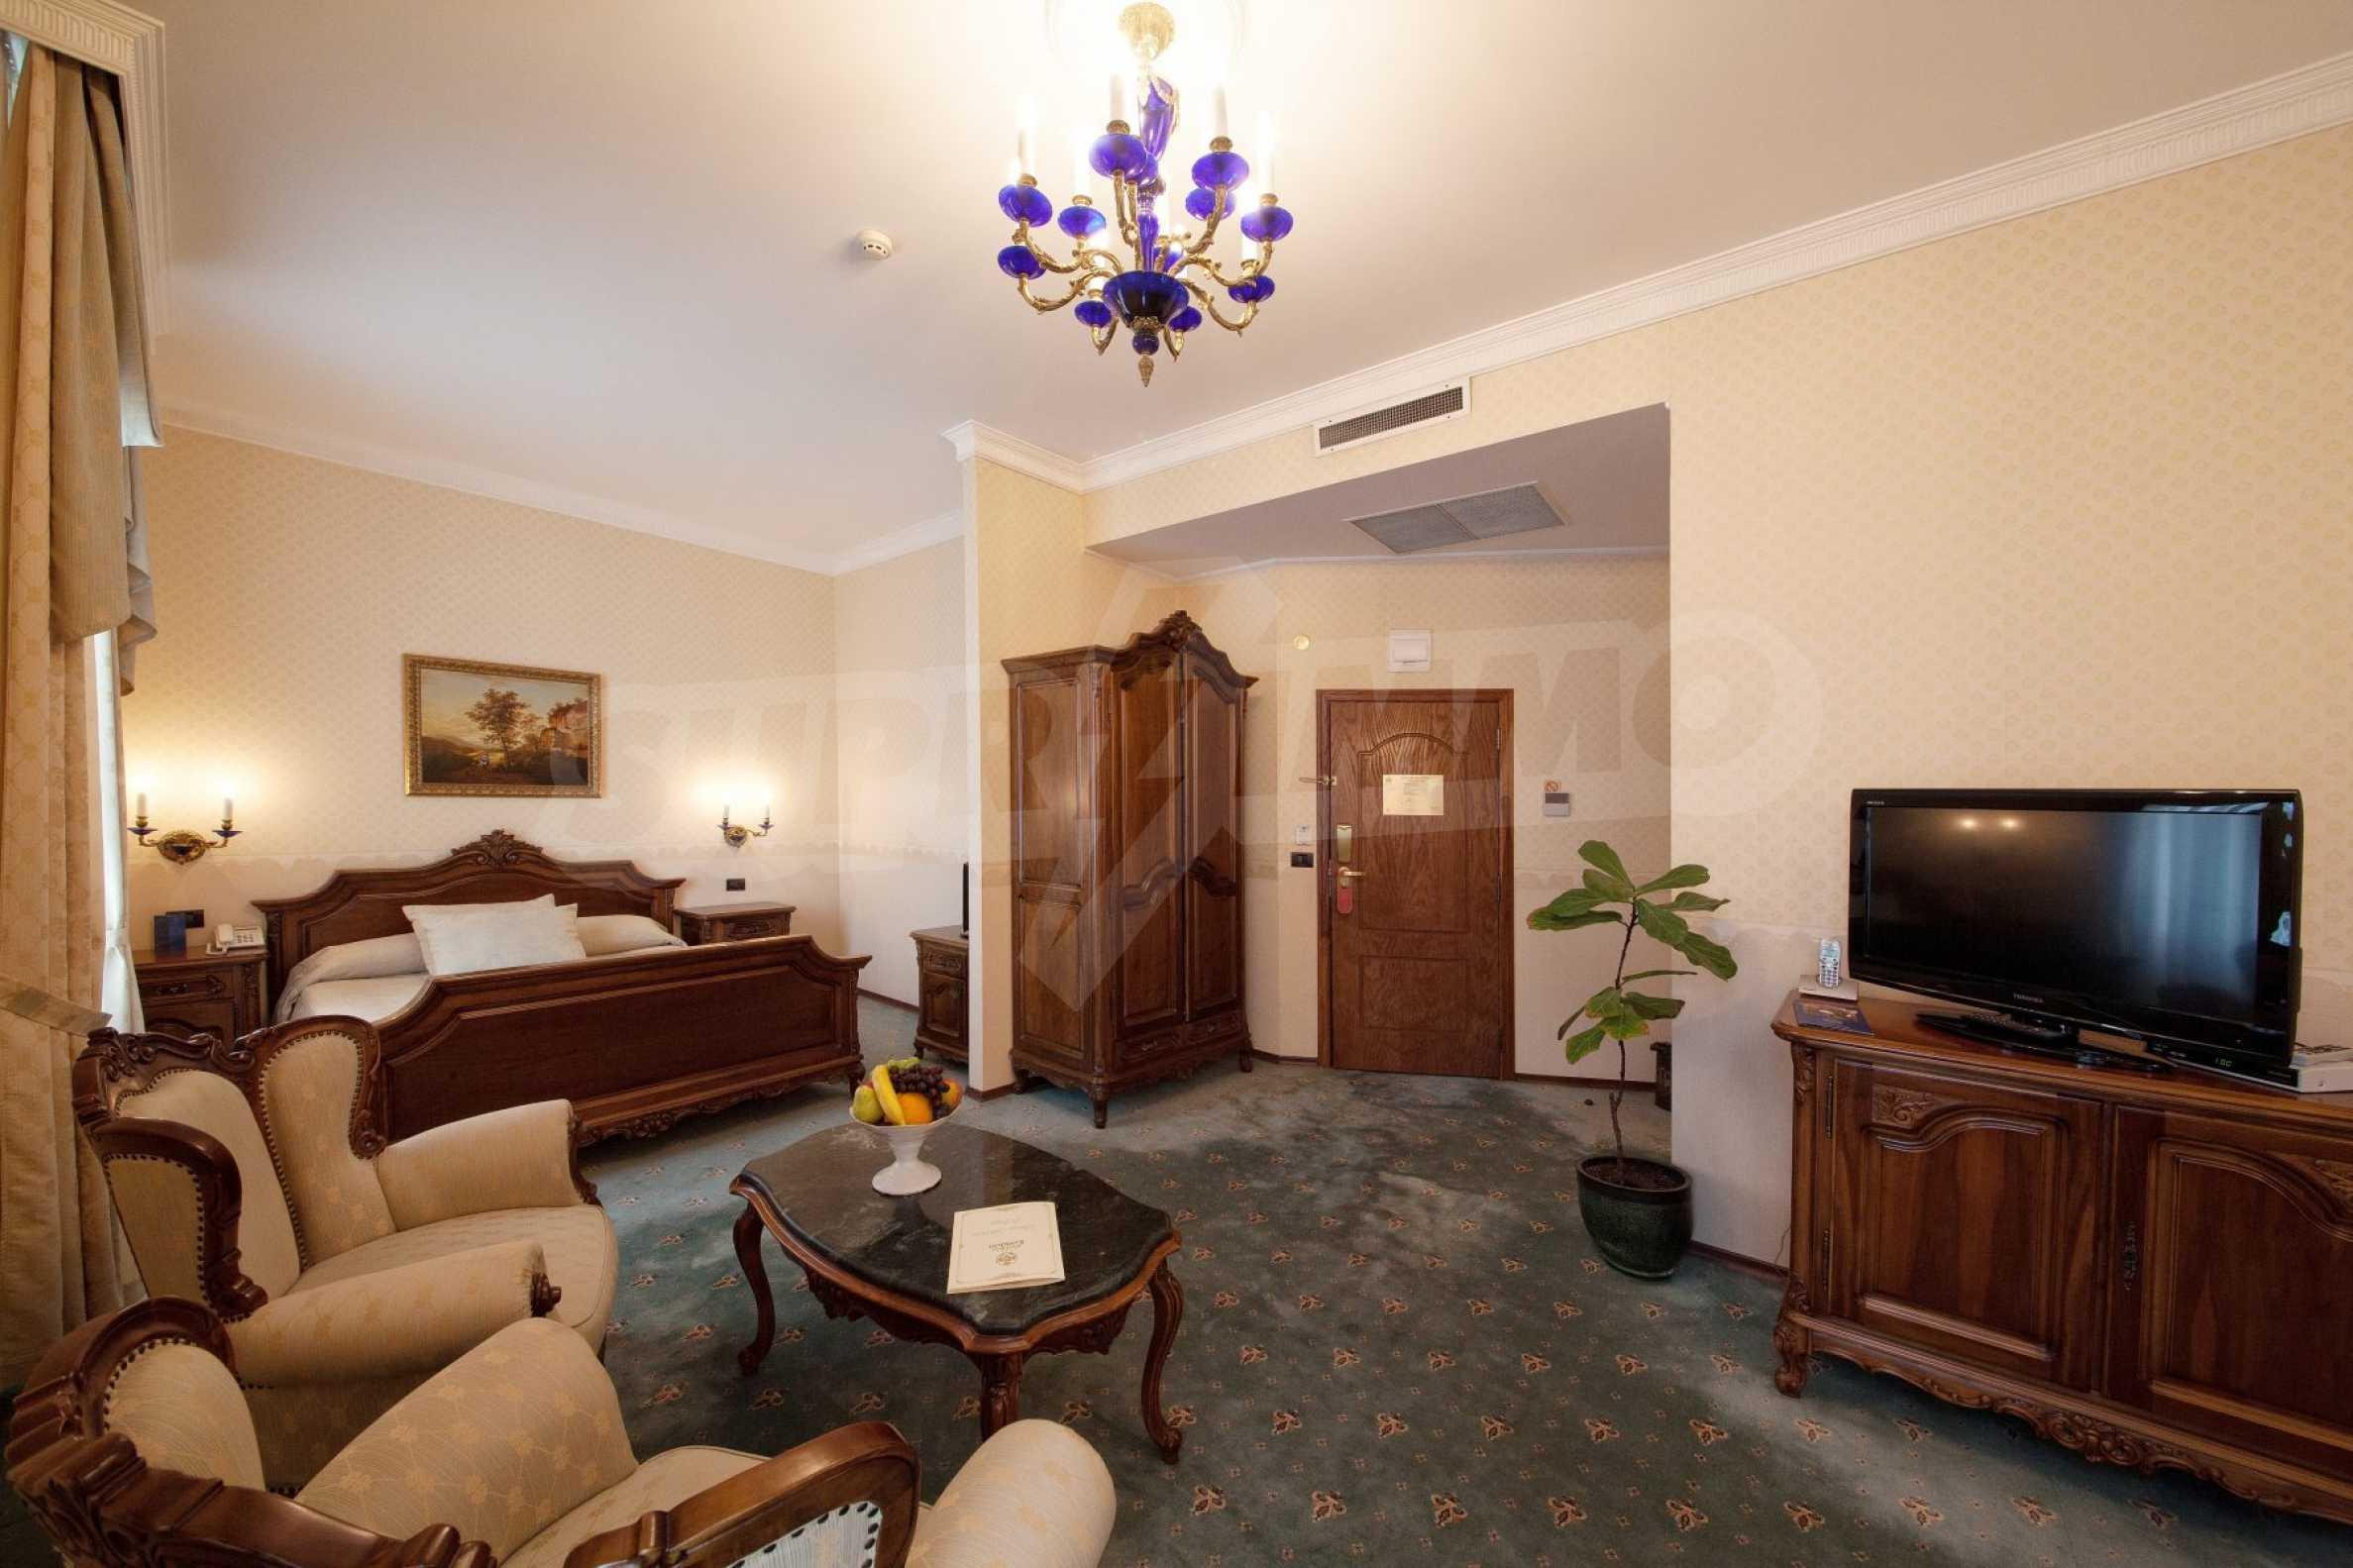 Fünf-Sterne-Hotel 2